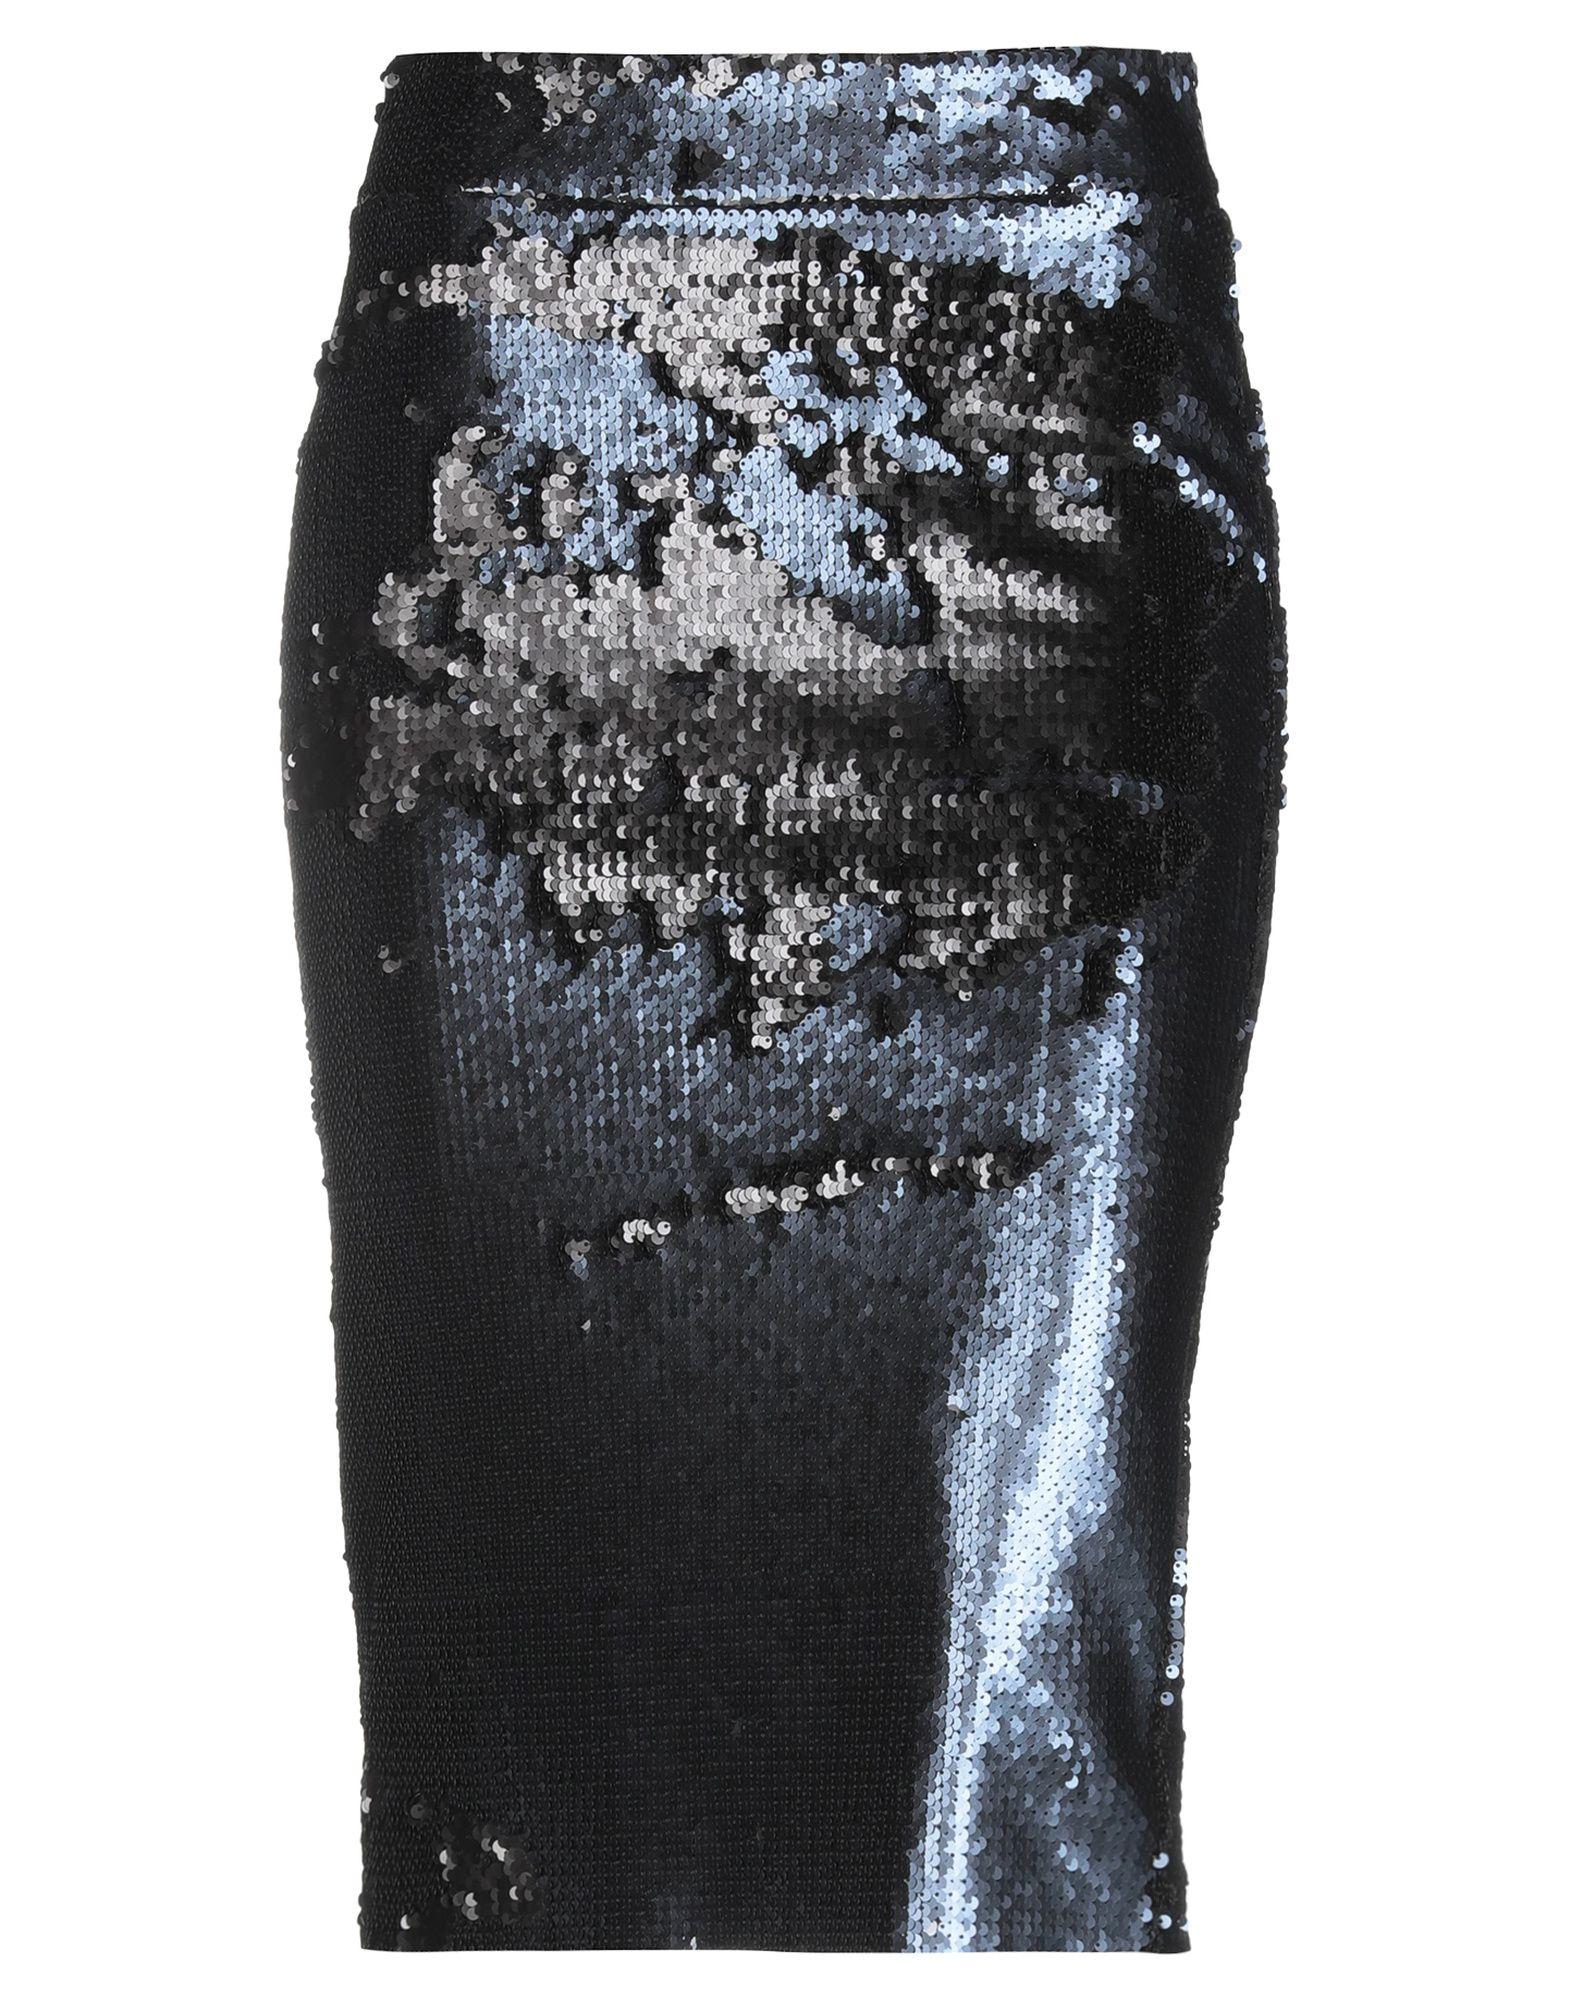 ESSENTIEL ANTWERP Юбка длиной 3/4 essentiel antwerp юбка длиной 3 4